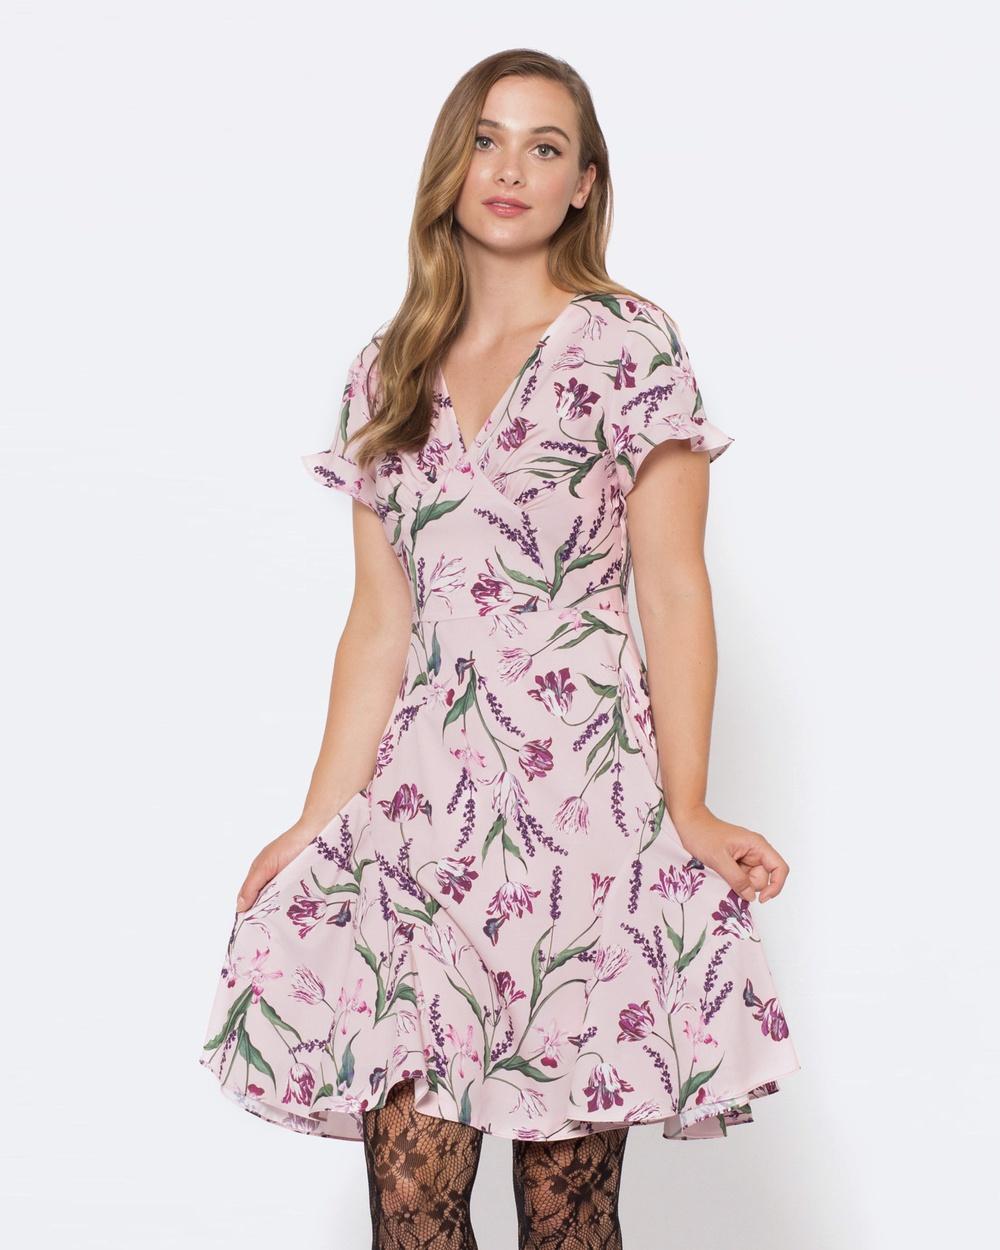 Alannah Hill Midnight Hour Dress Dresses Pink Midnight Hour Dress